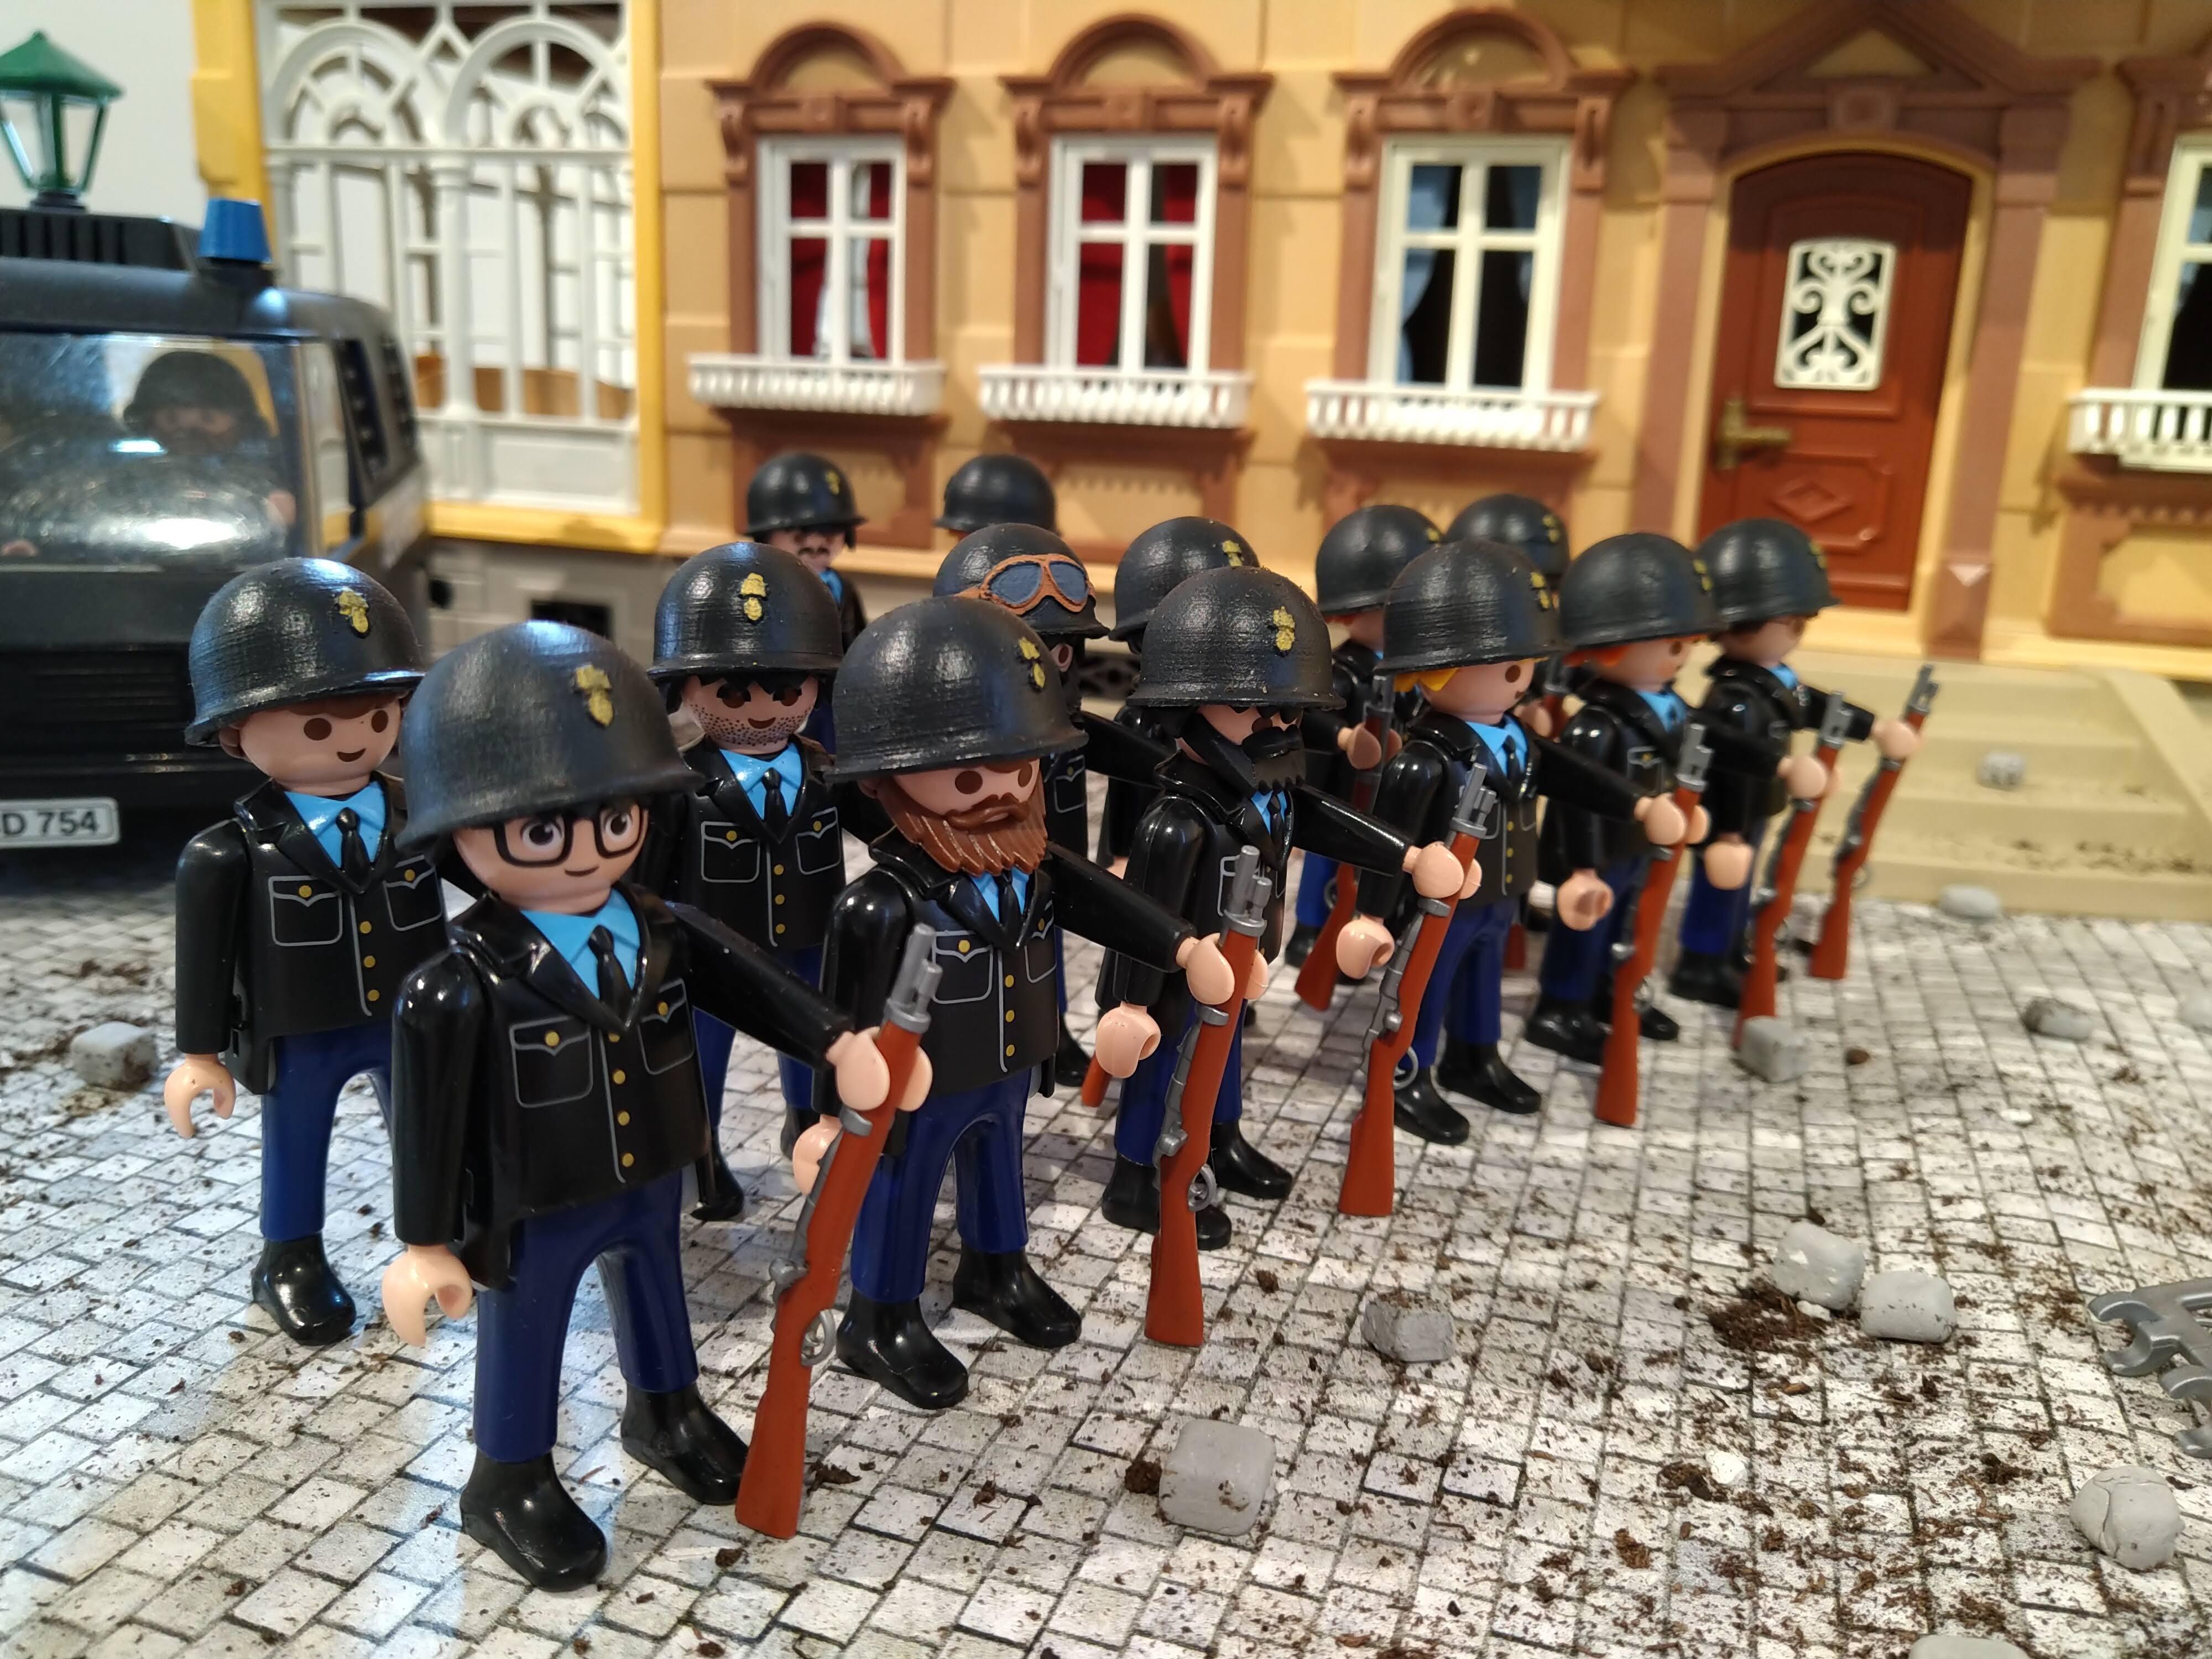 Expoition playmobil gendarmerie pendant mai 68